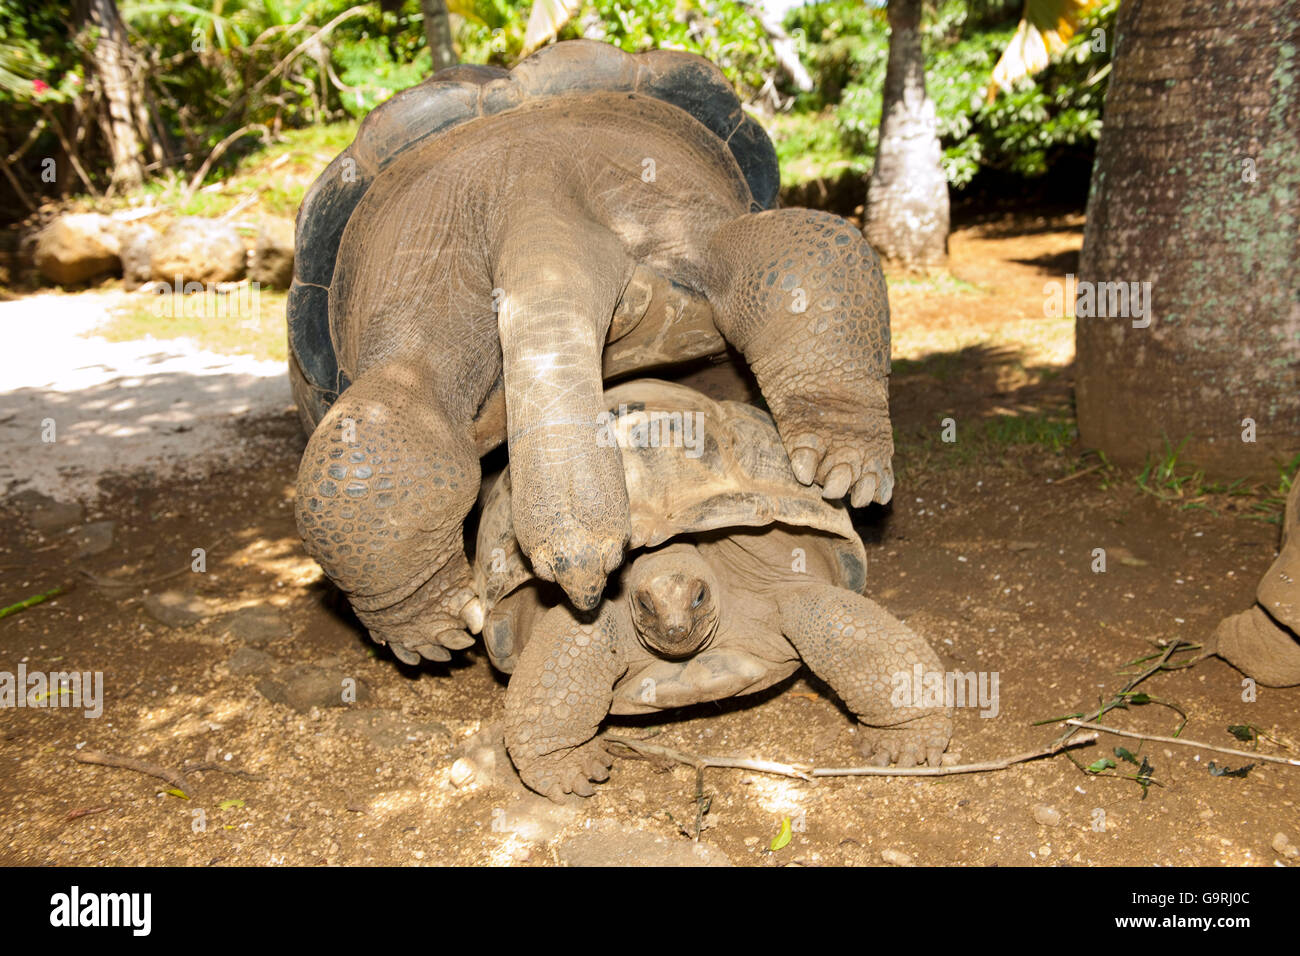 Aldabra giant tortoise, Mauritius, Africa, Indian Ocean /  (Aldabrachelys gigantea) - Stock Image